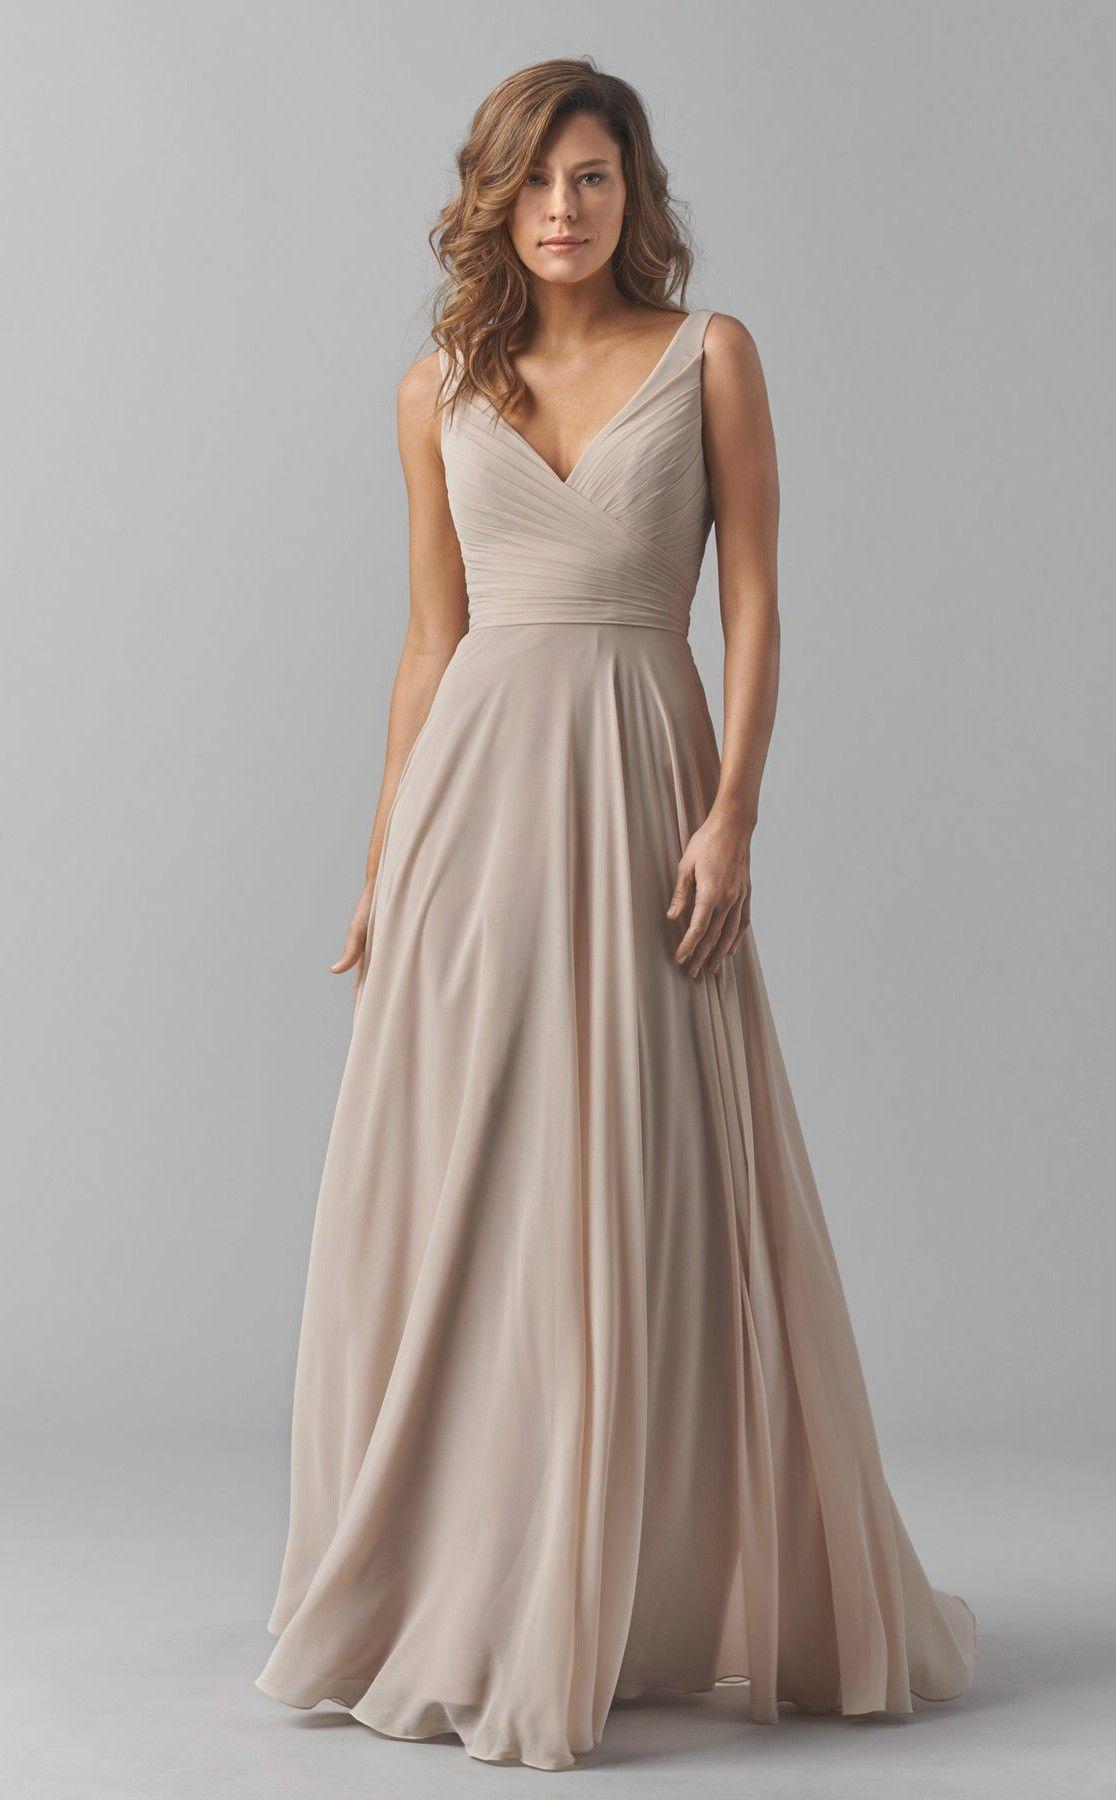 Chiffon long beige v neck bridesmaid dress bdca random stuff